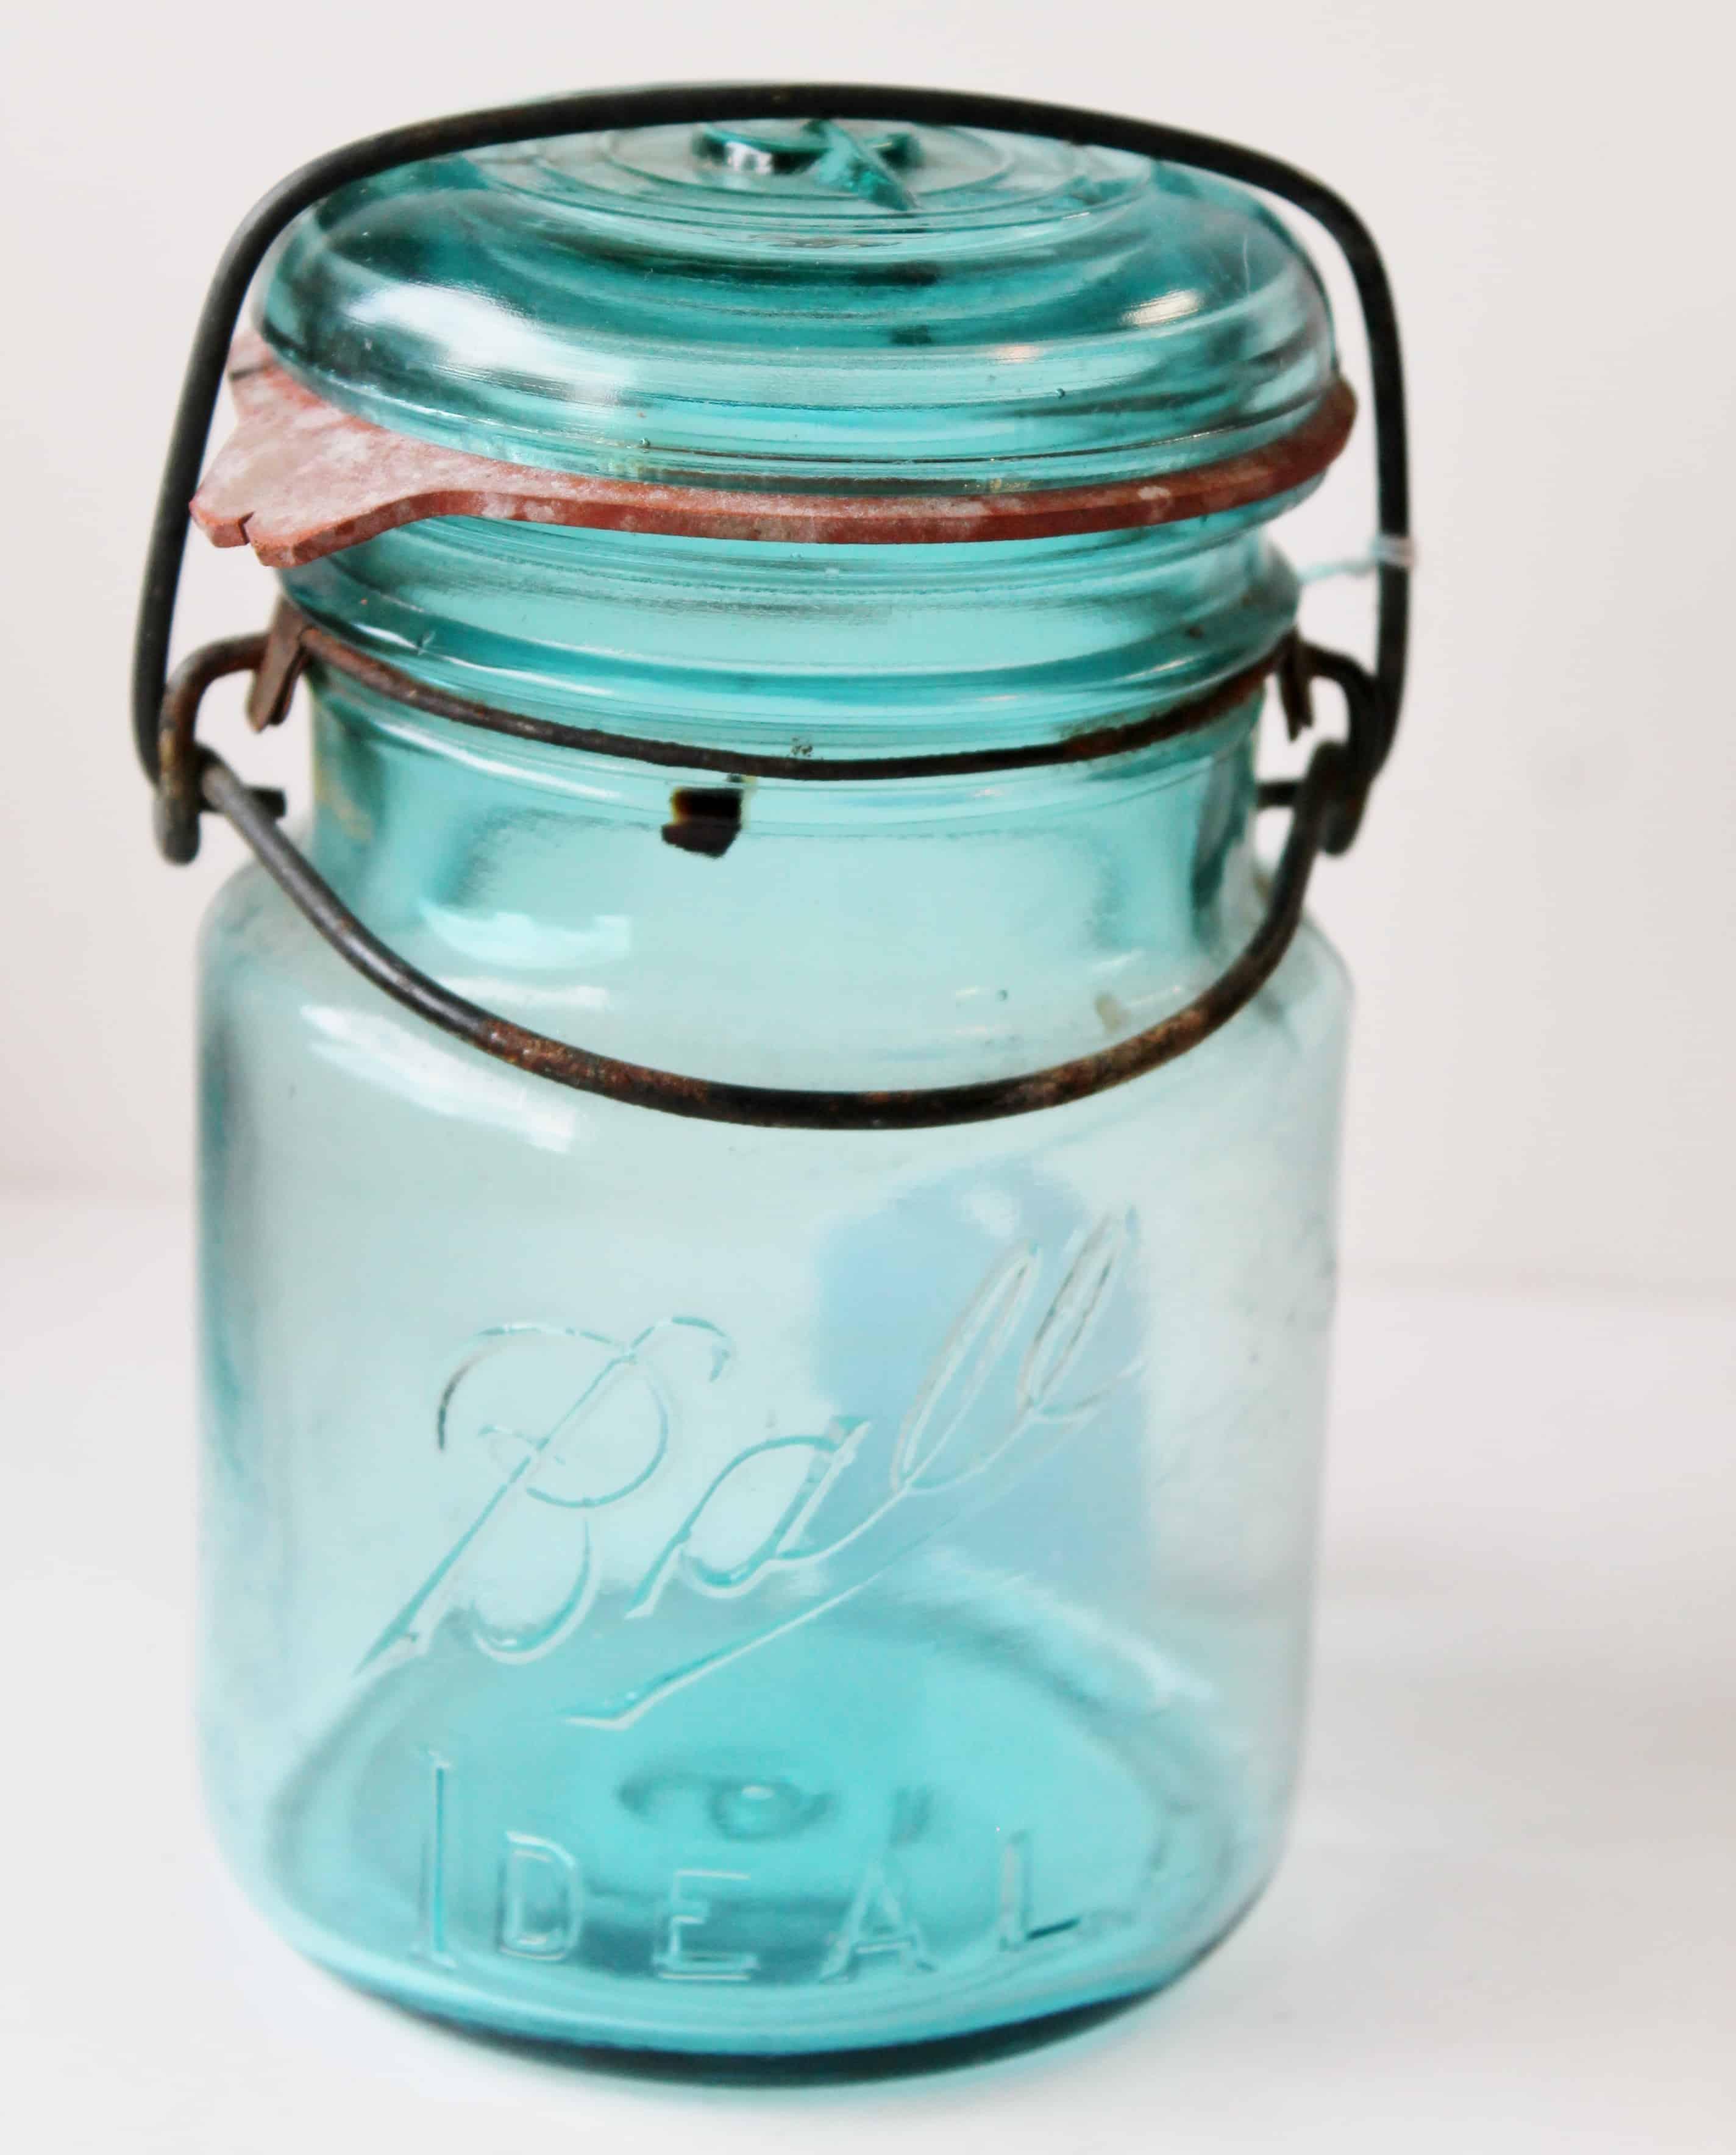 Antique & Vintage Canning Jar Price Guide • Adirondack